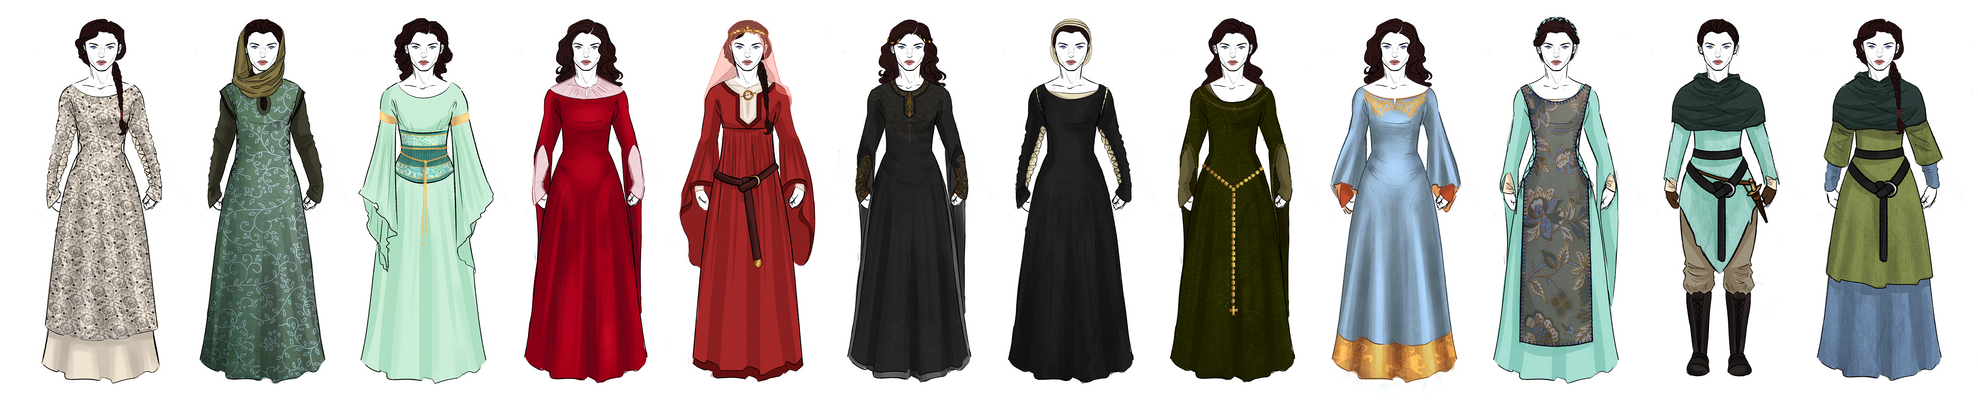 S2 Marian Redesigns - BBC Robin Hood by OtakuGirl16